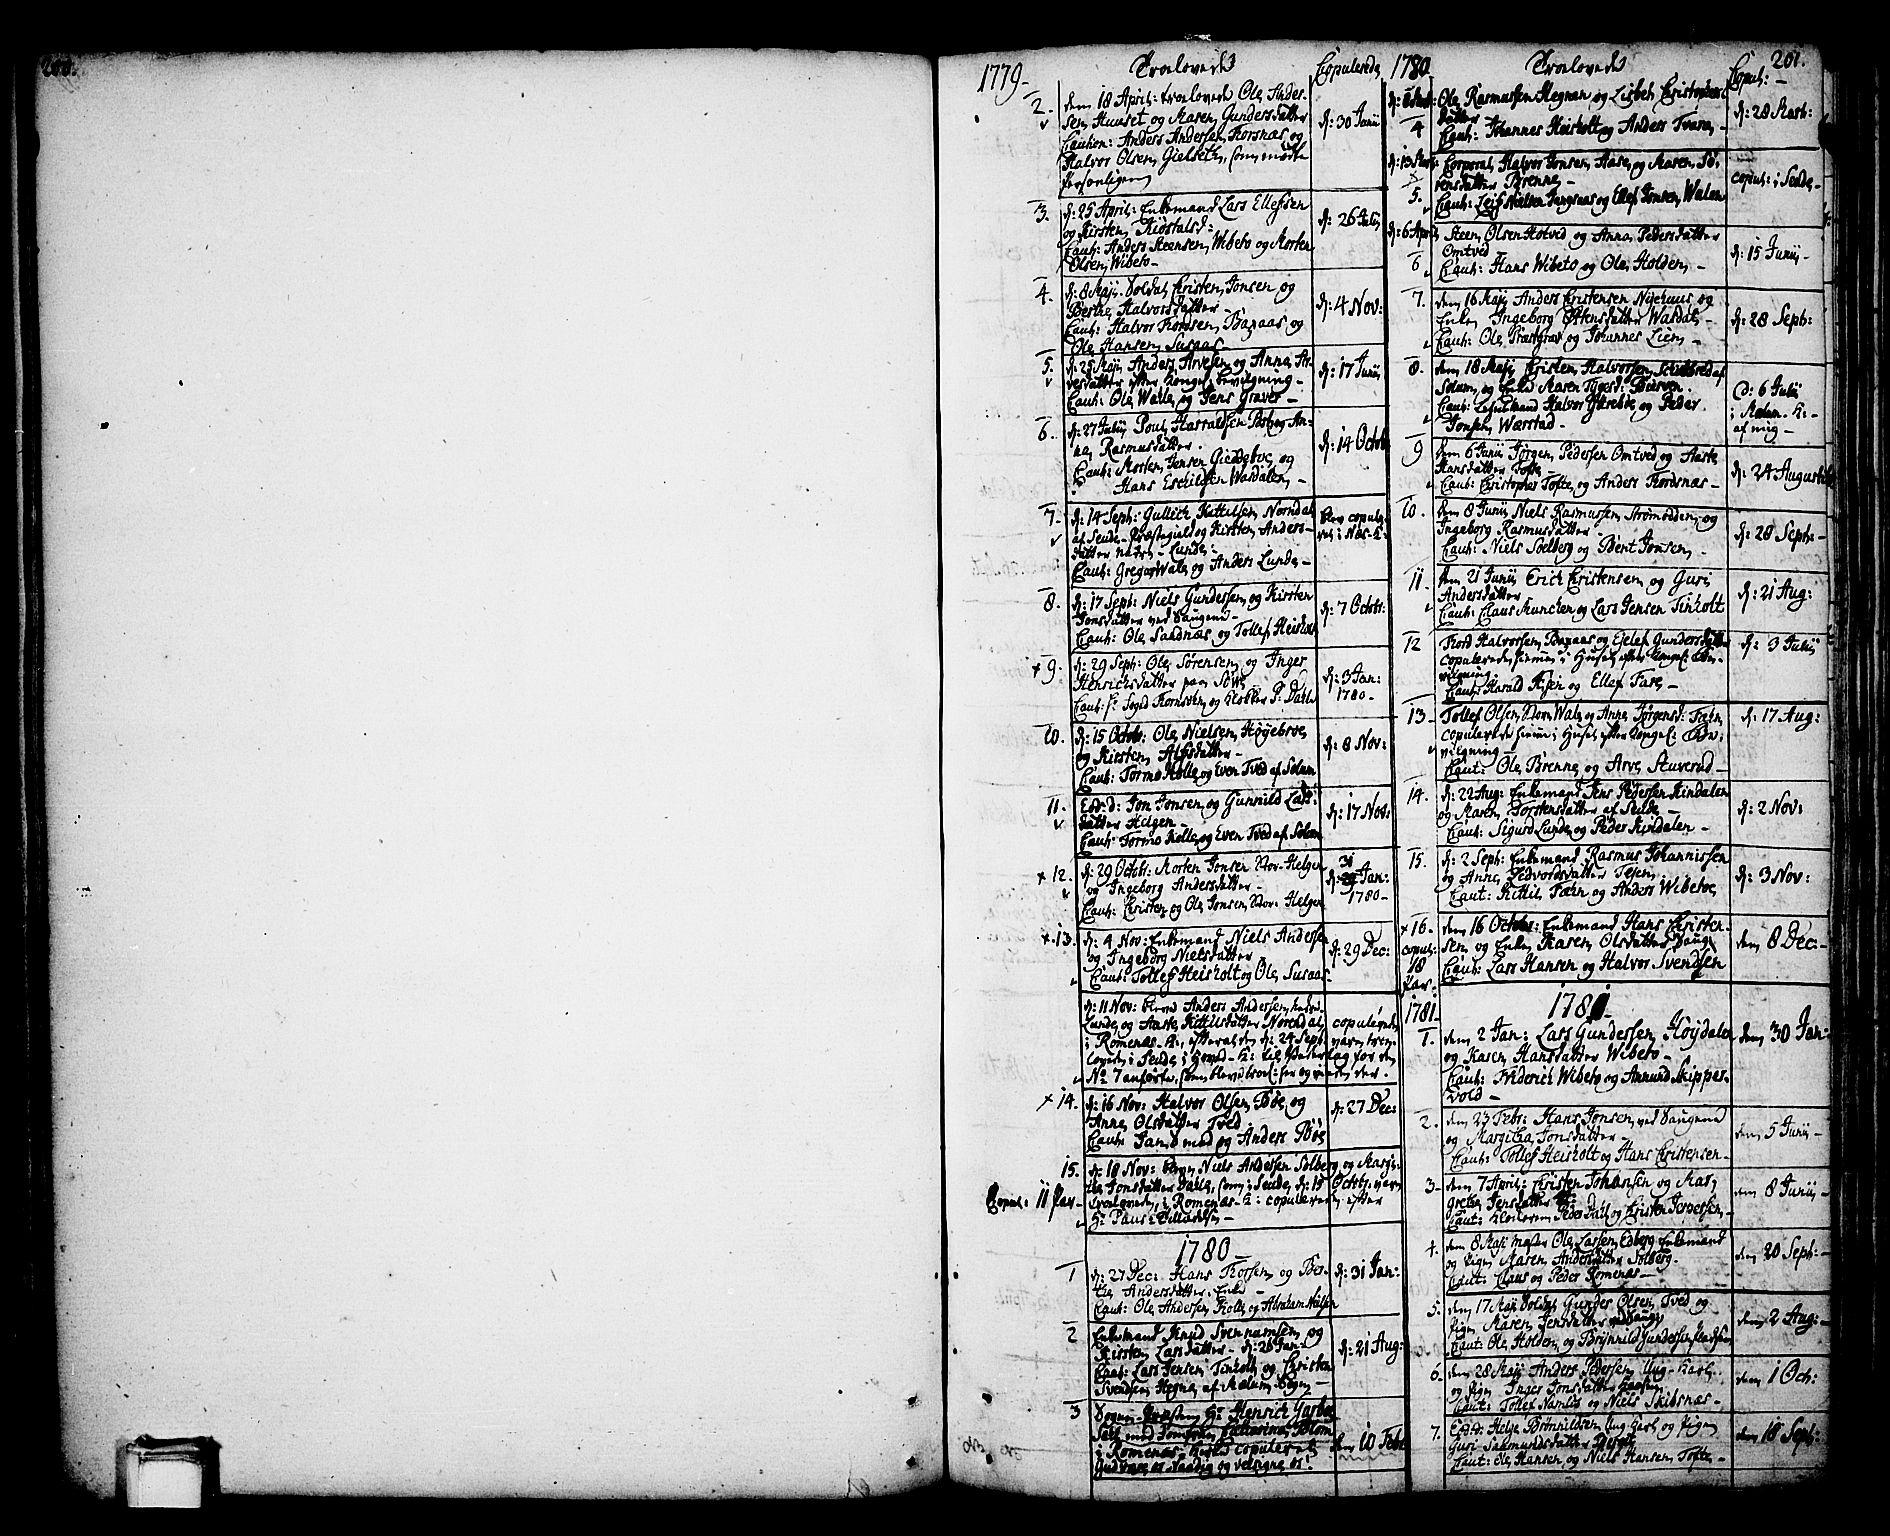 SAKO, Holla kirkebøker, F/Fa/L0002: Ministerialbok nr. 2, 1779-1814, s. 200-201